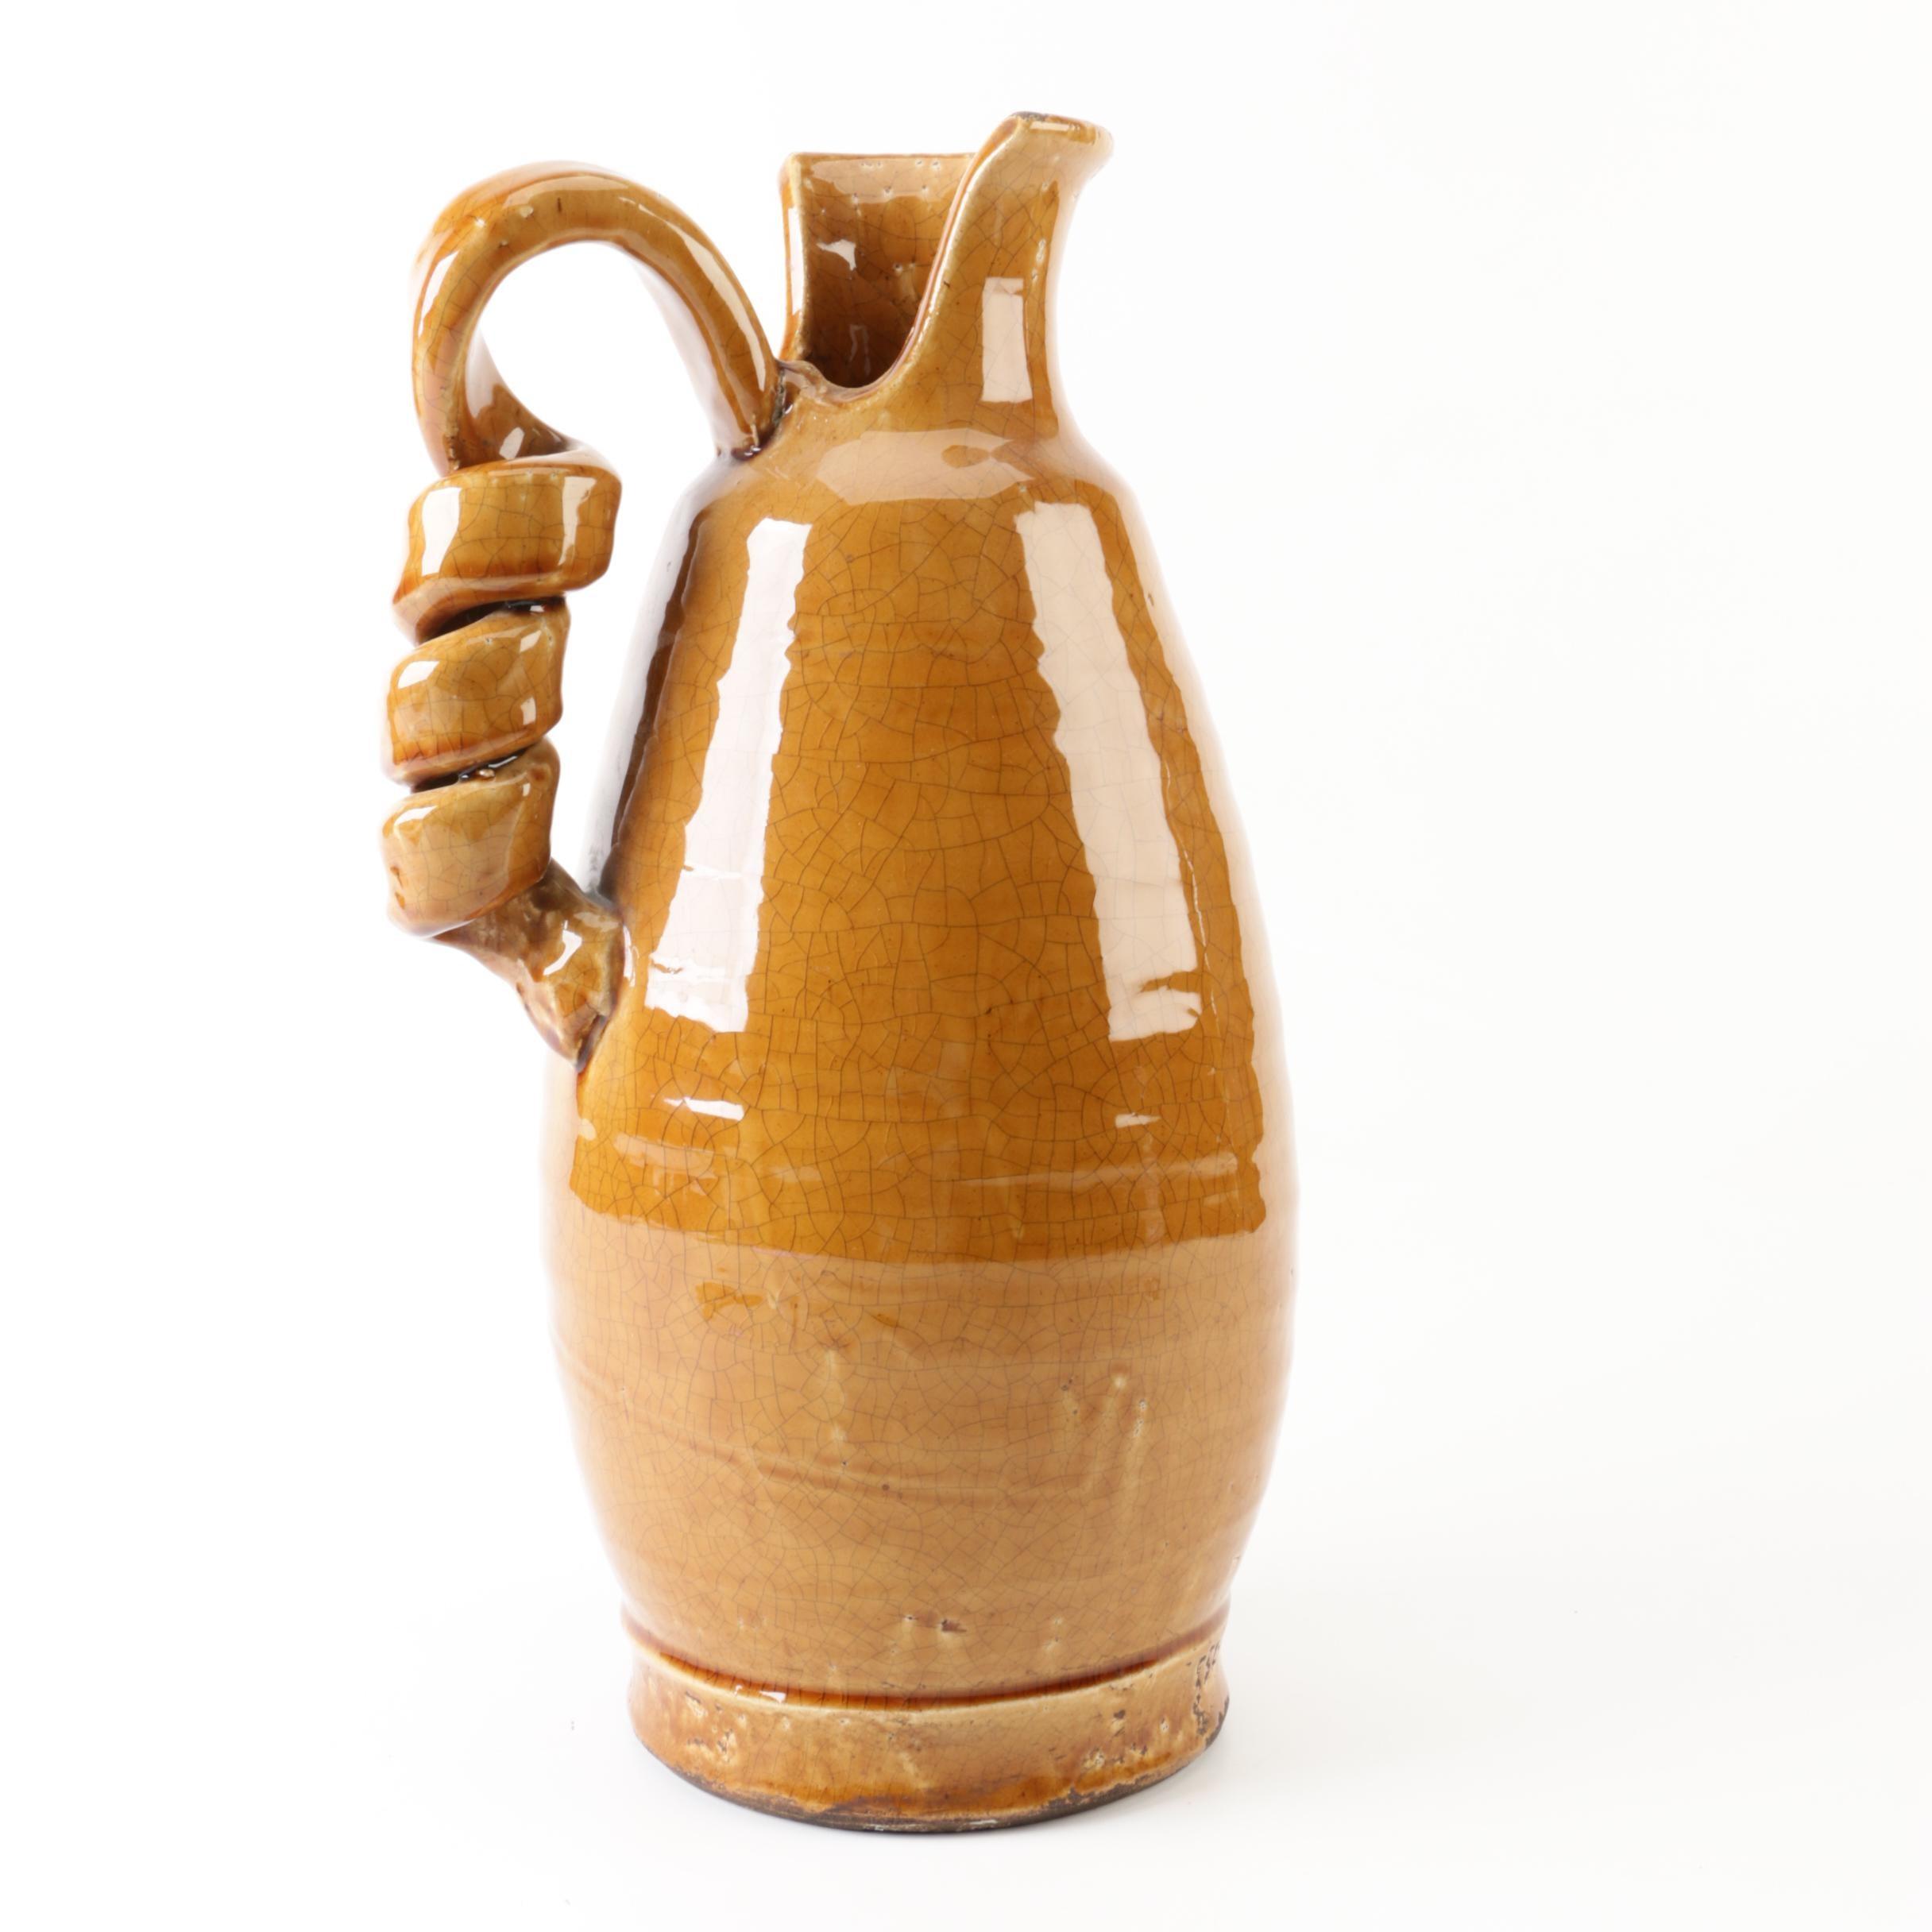 Decorative Ceramic Vase with Corkscrew Handle